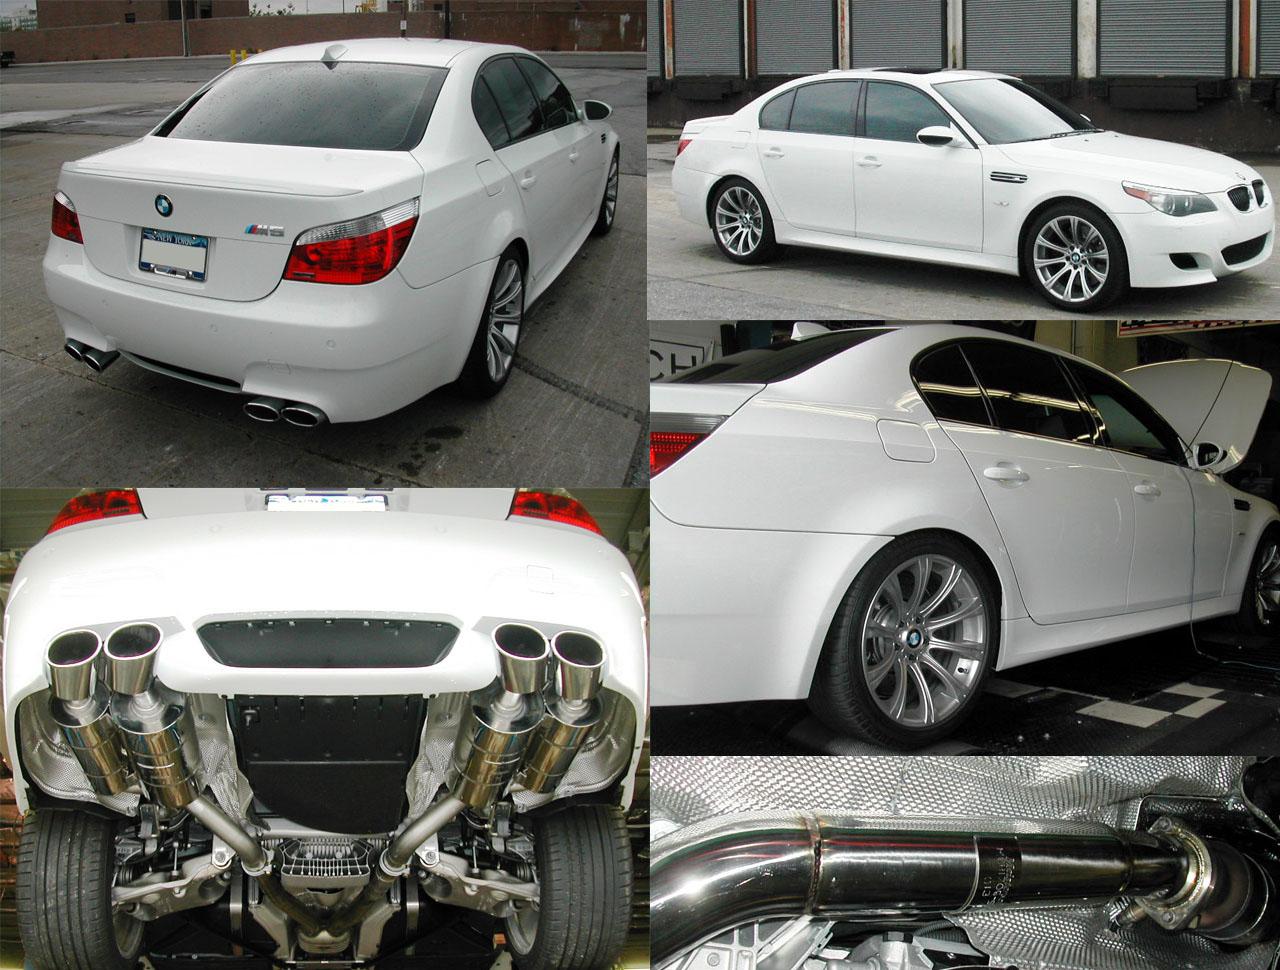 http://3.bp.blogspot.com/_s4TUxPHrc3g/S8RSPGYA9ZI/AAAAAAAAACE/lonShviIlxM/s1600/10871-2006-BMW-M5.jpg